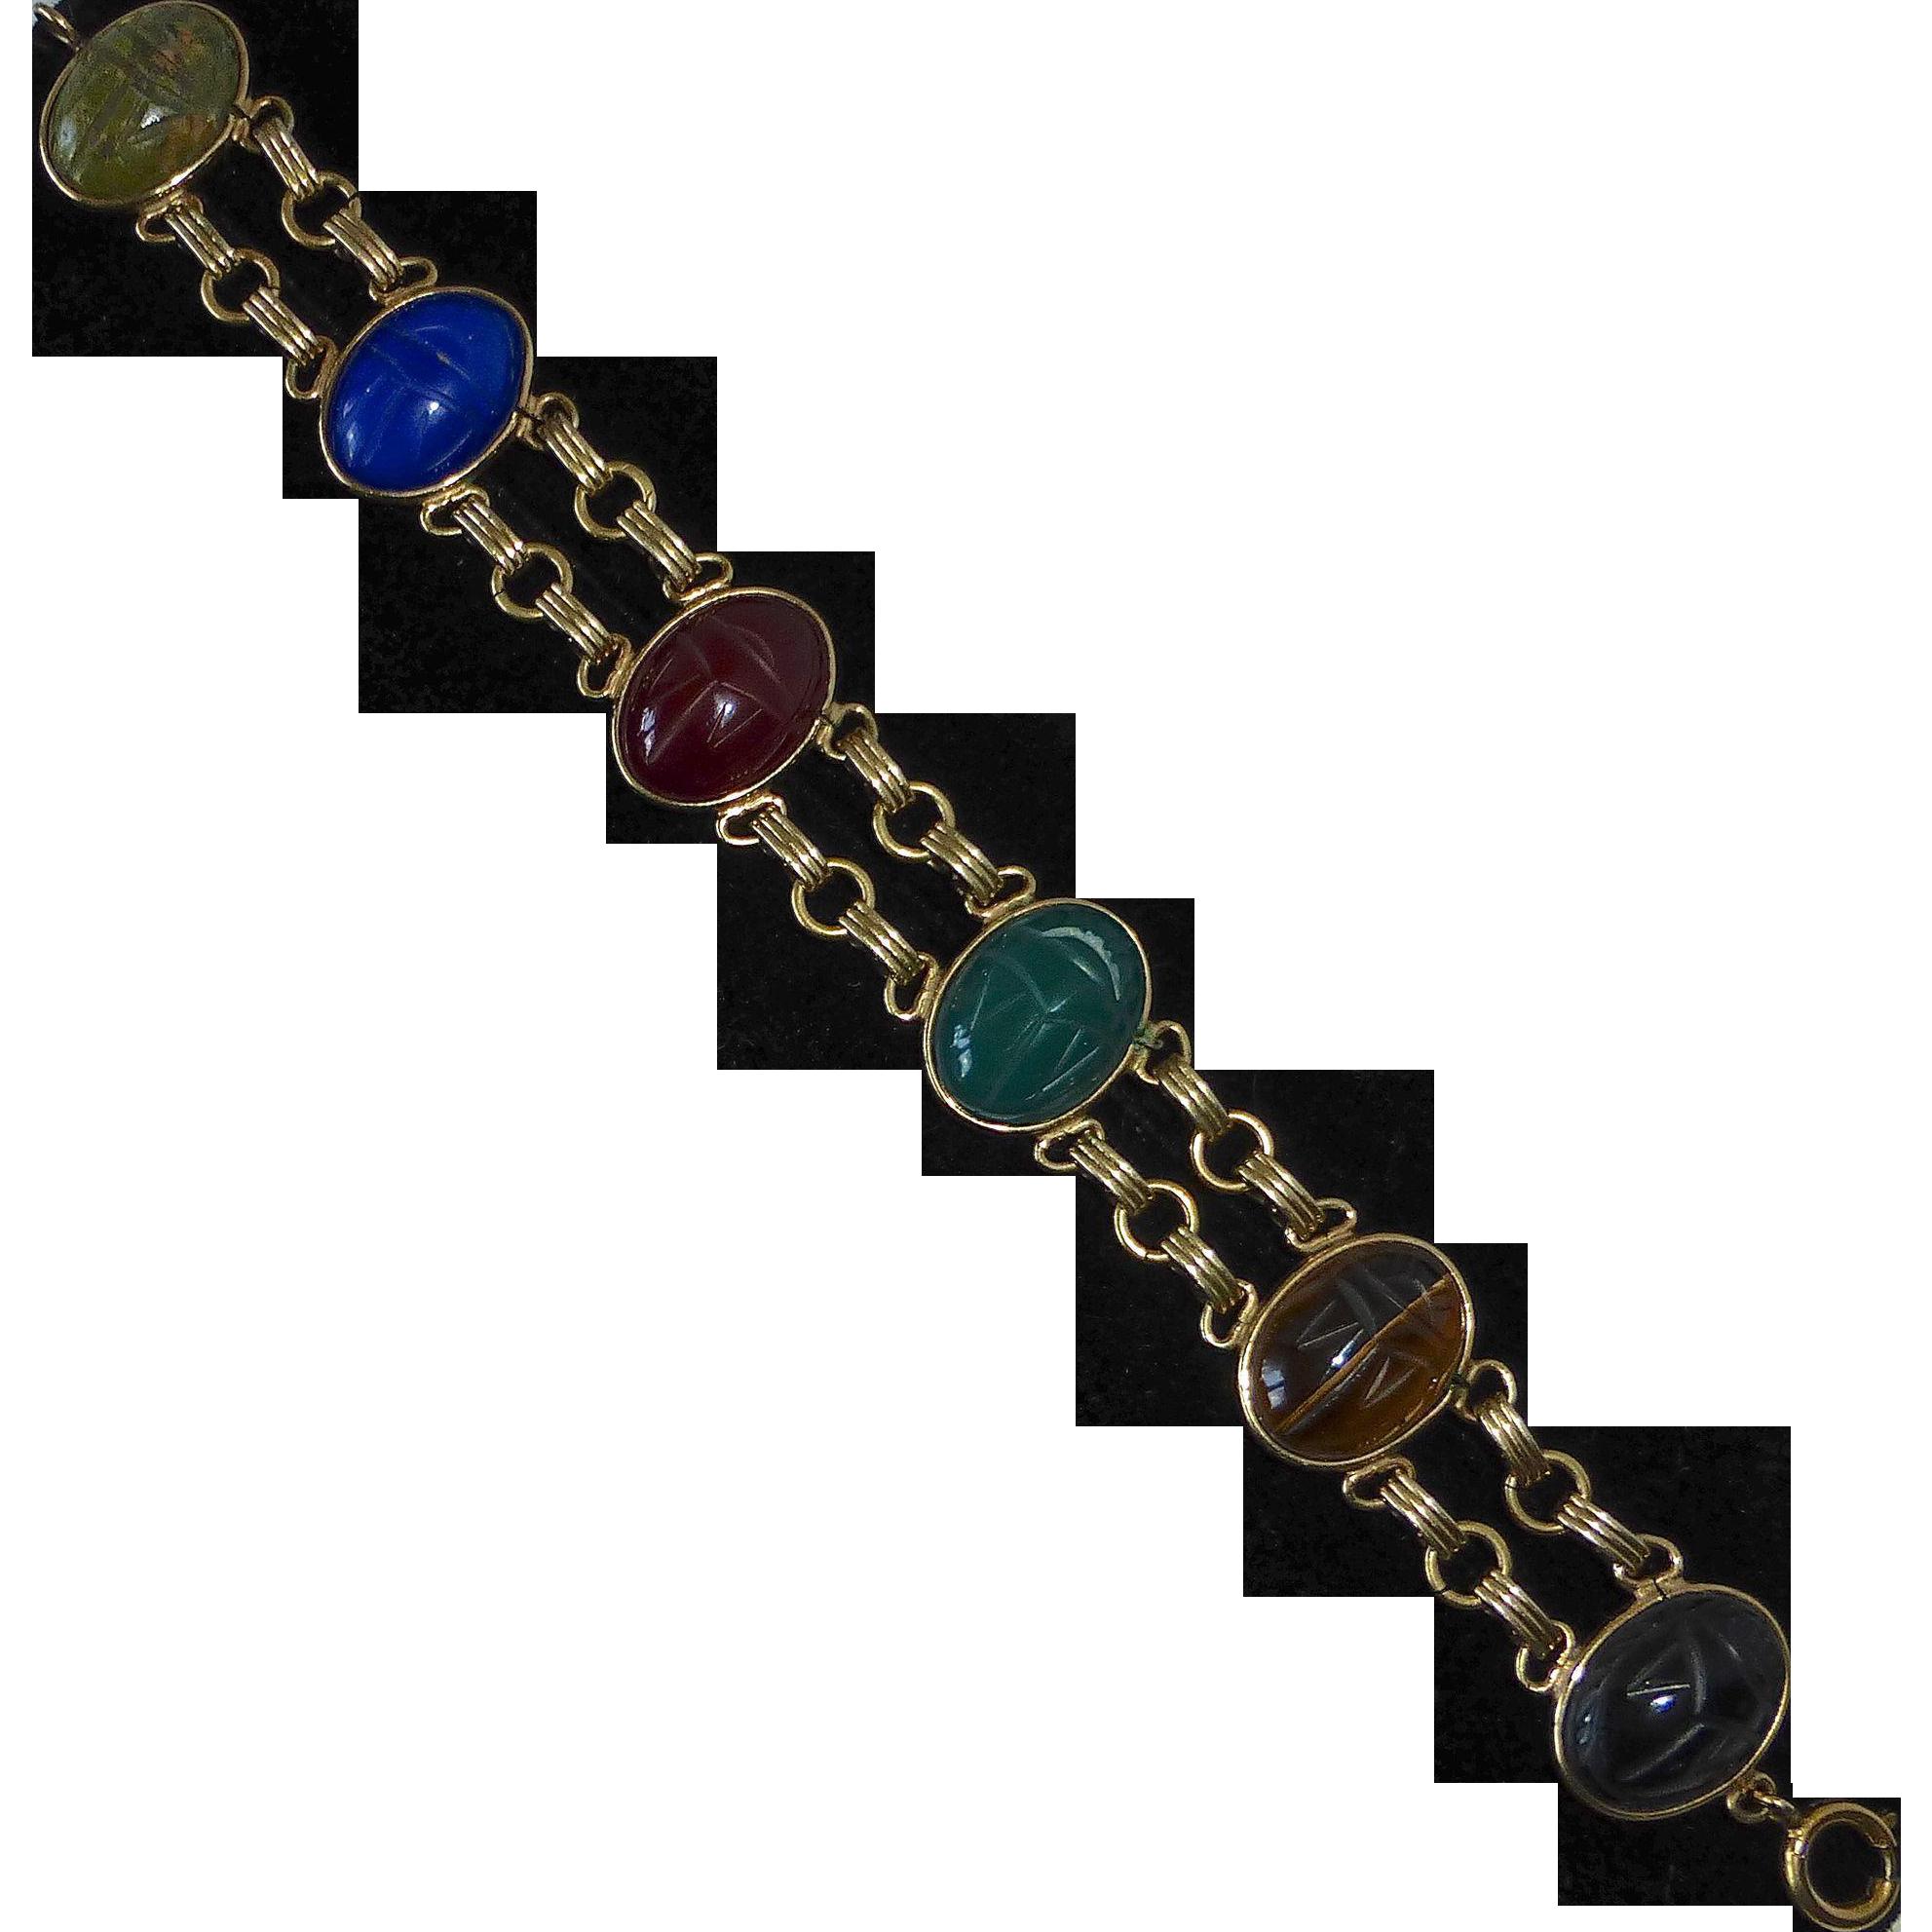 Egyptian Revival GF Bracelet Gemstone Scarabs c1950s